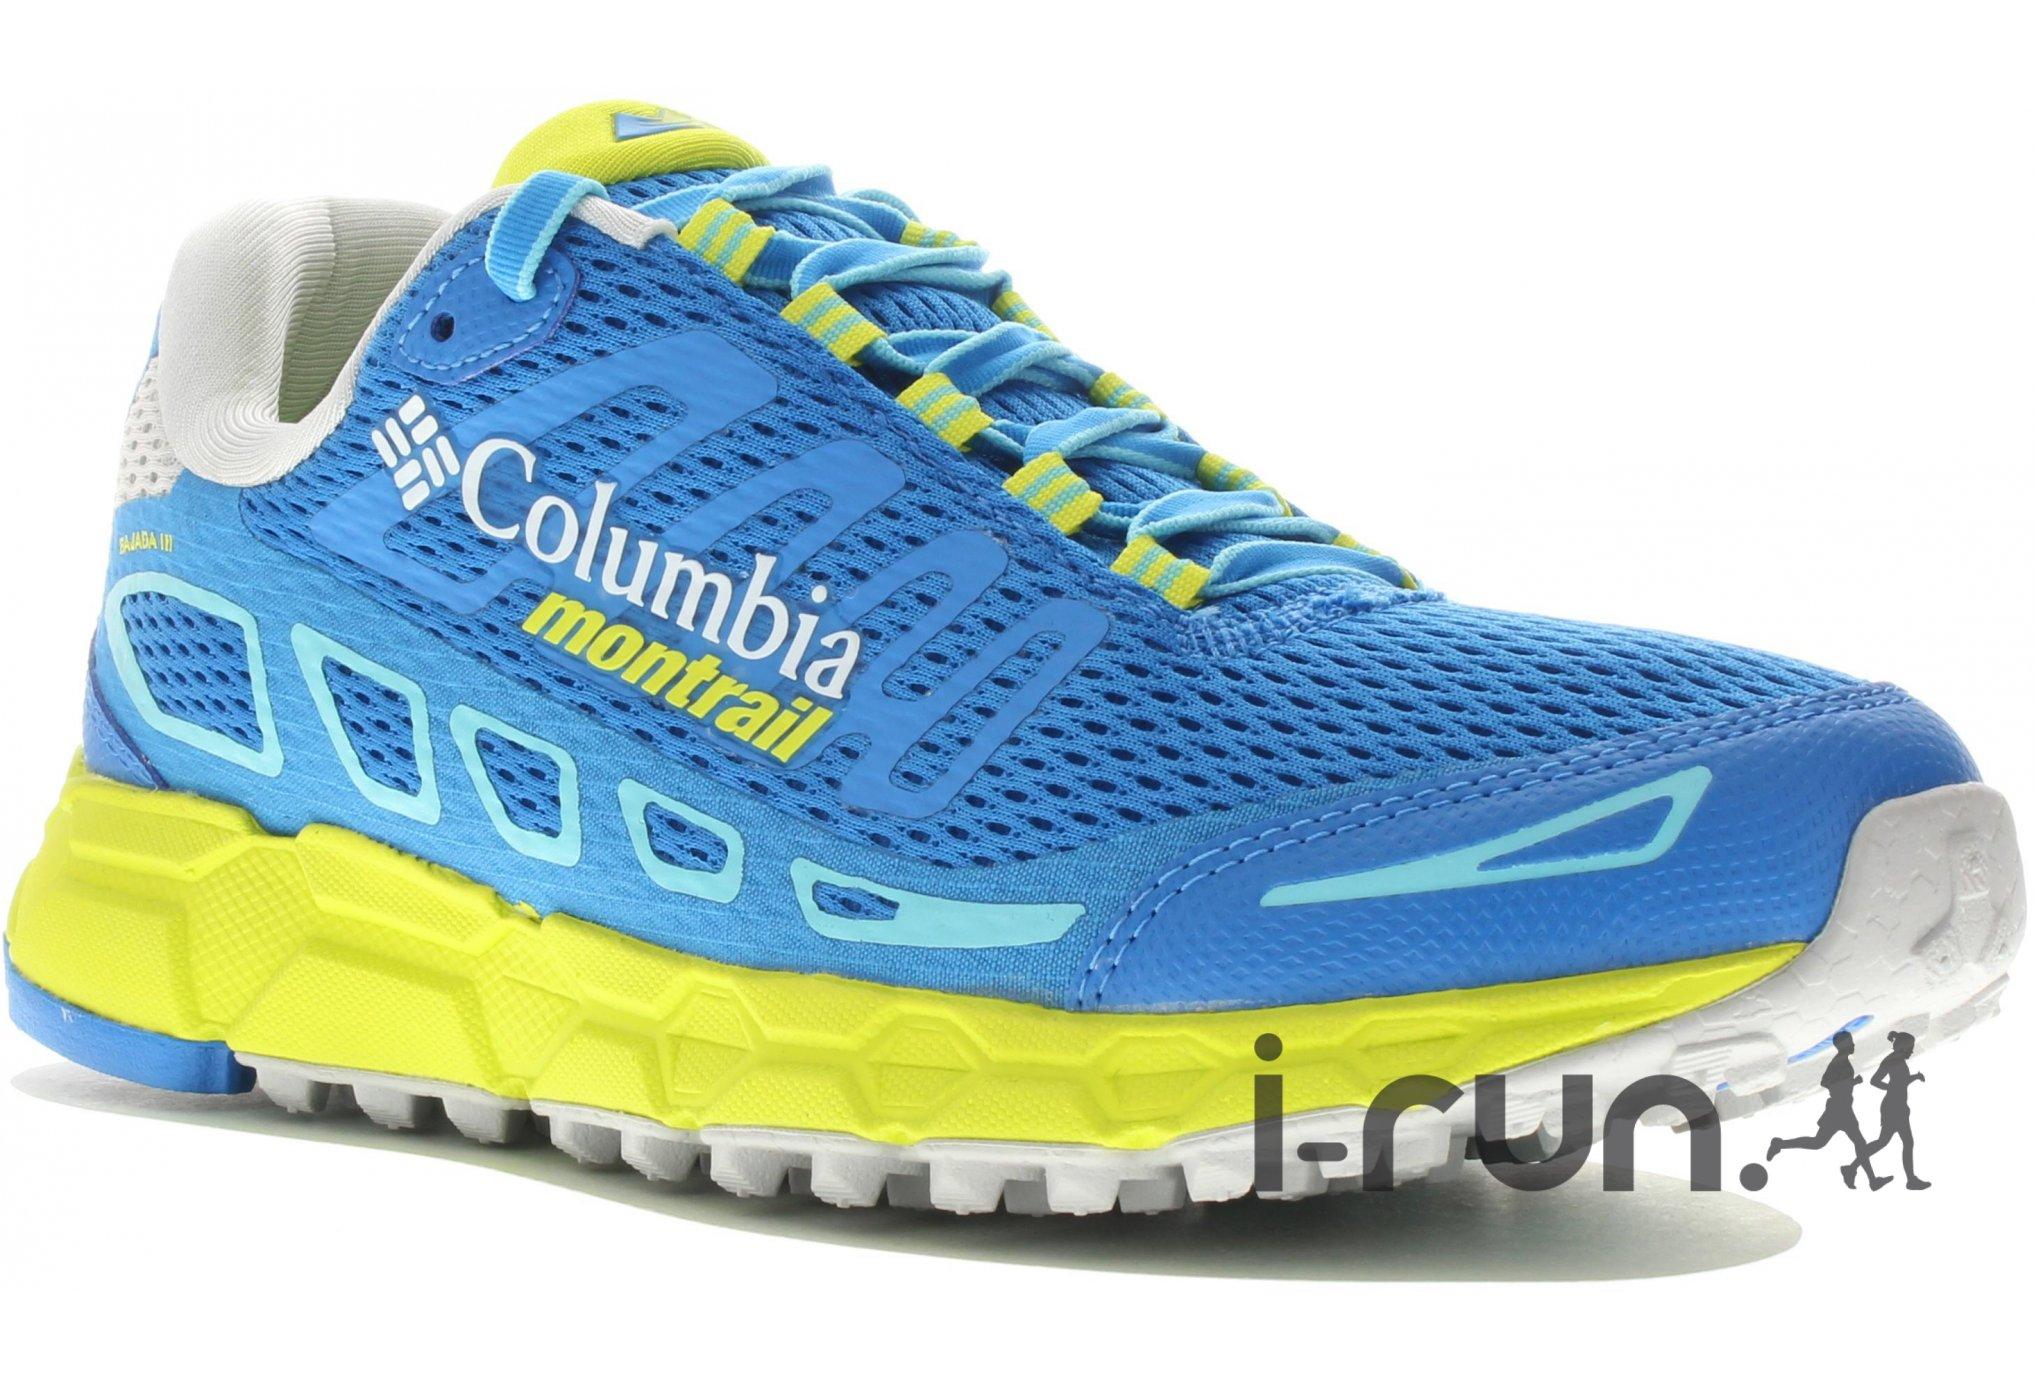 Columbia Bajada iii w chaussures running femme